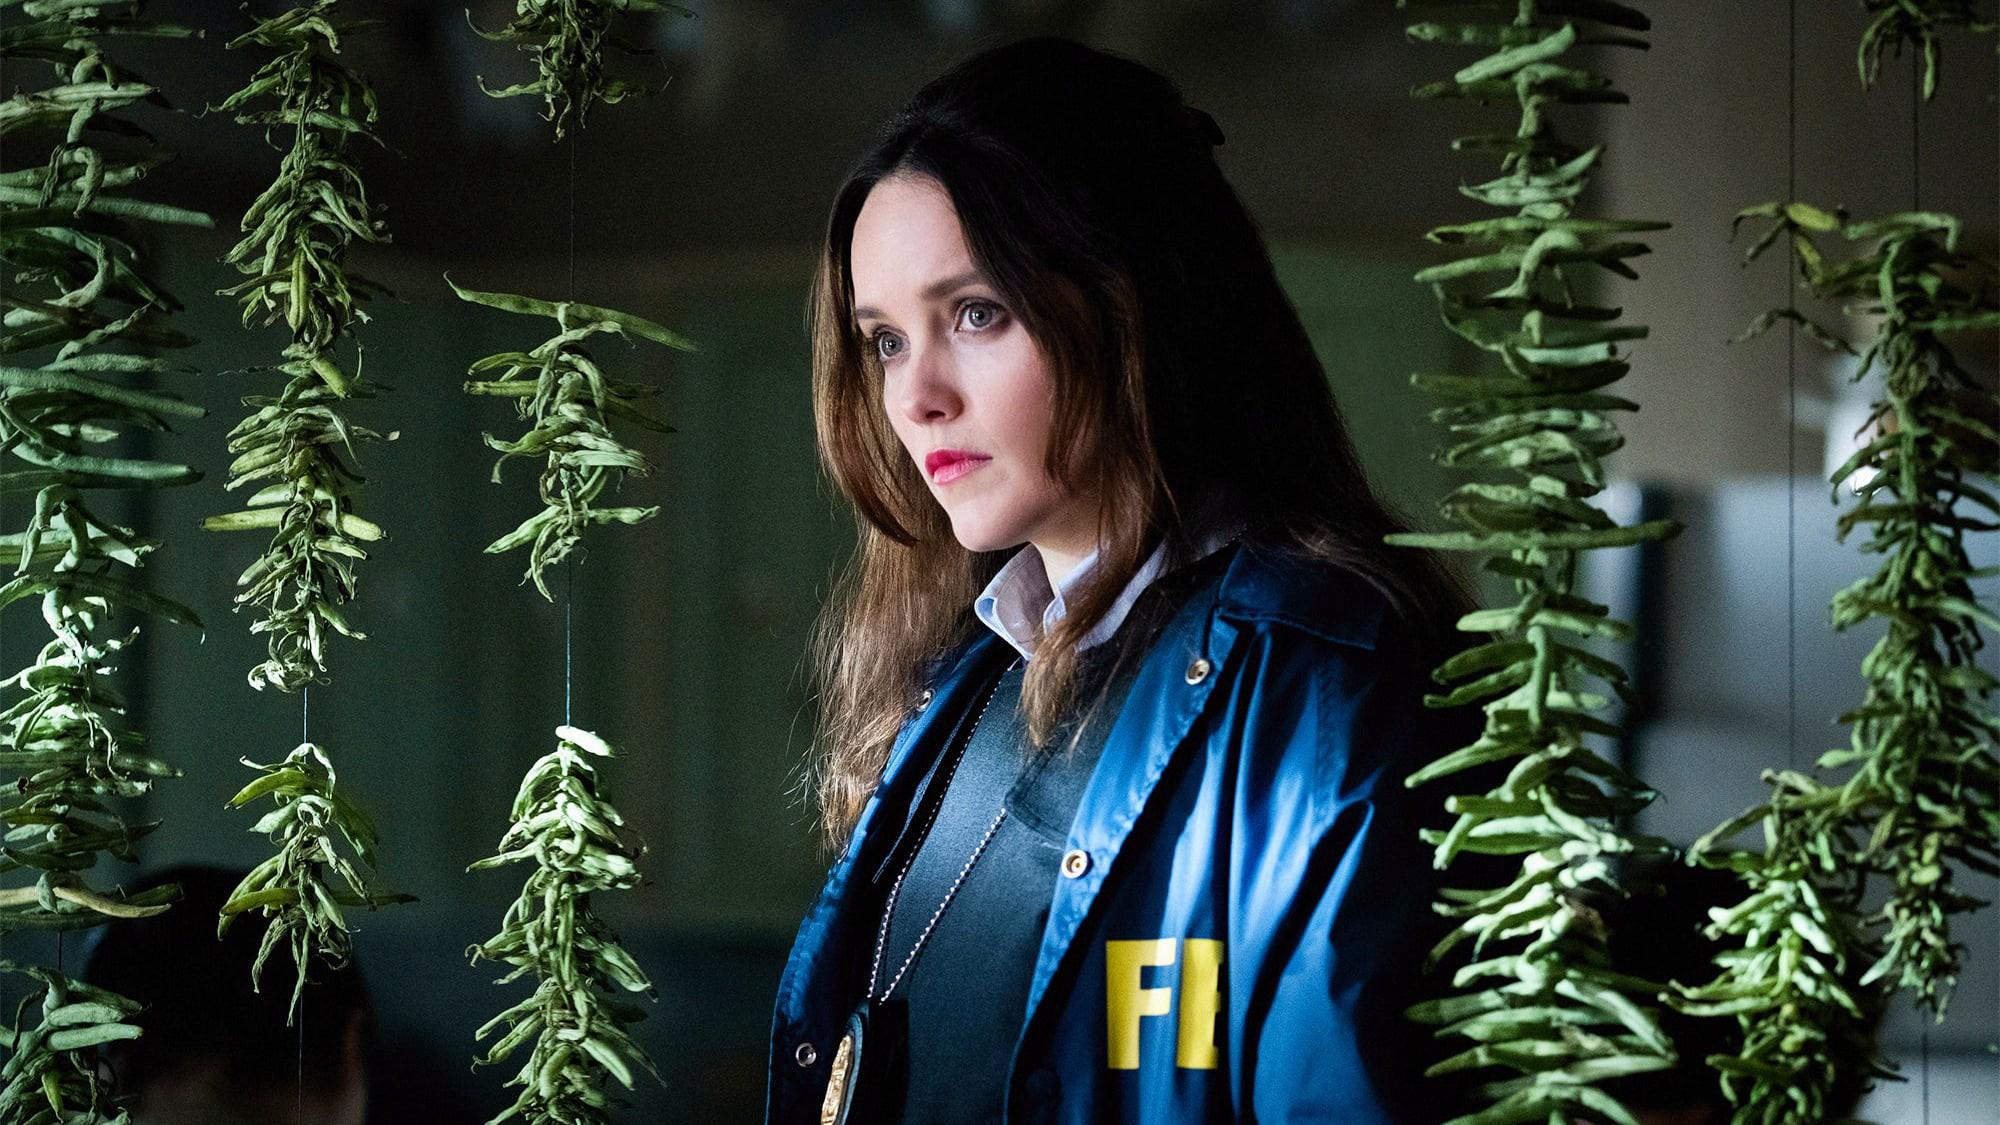 Clarice Season 1 Episode 2 Release Date & Preview